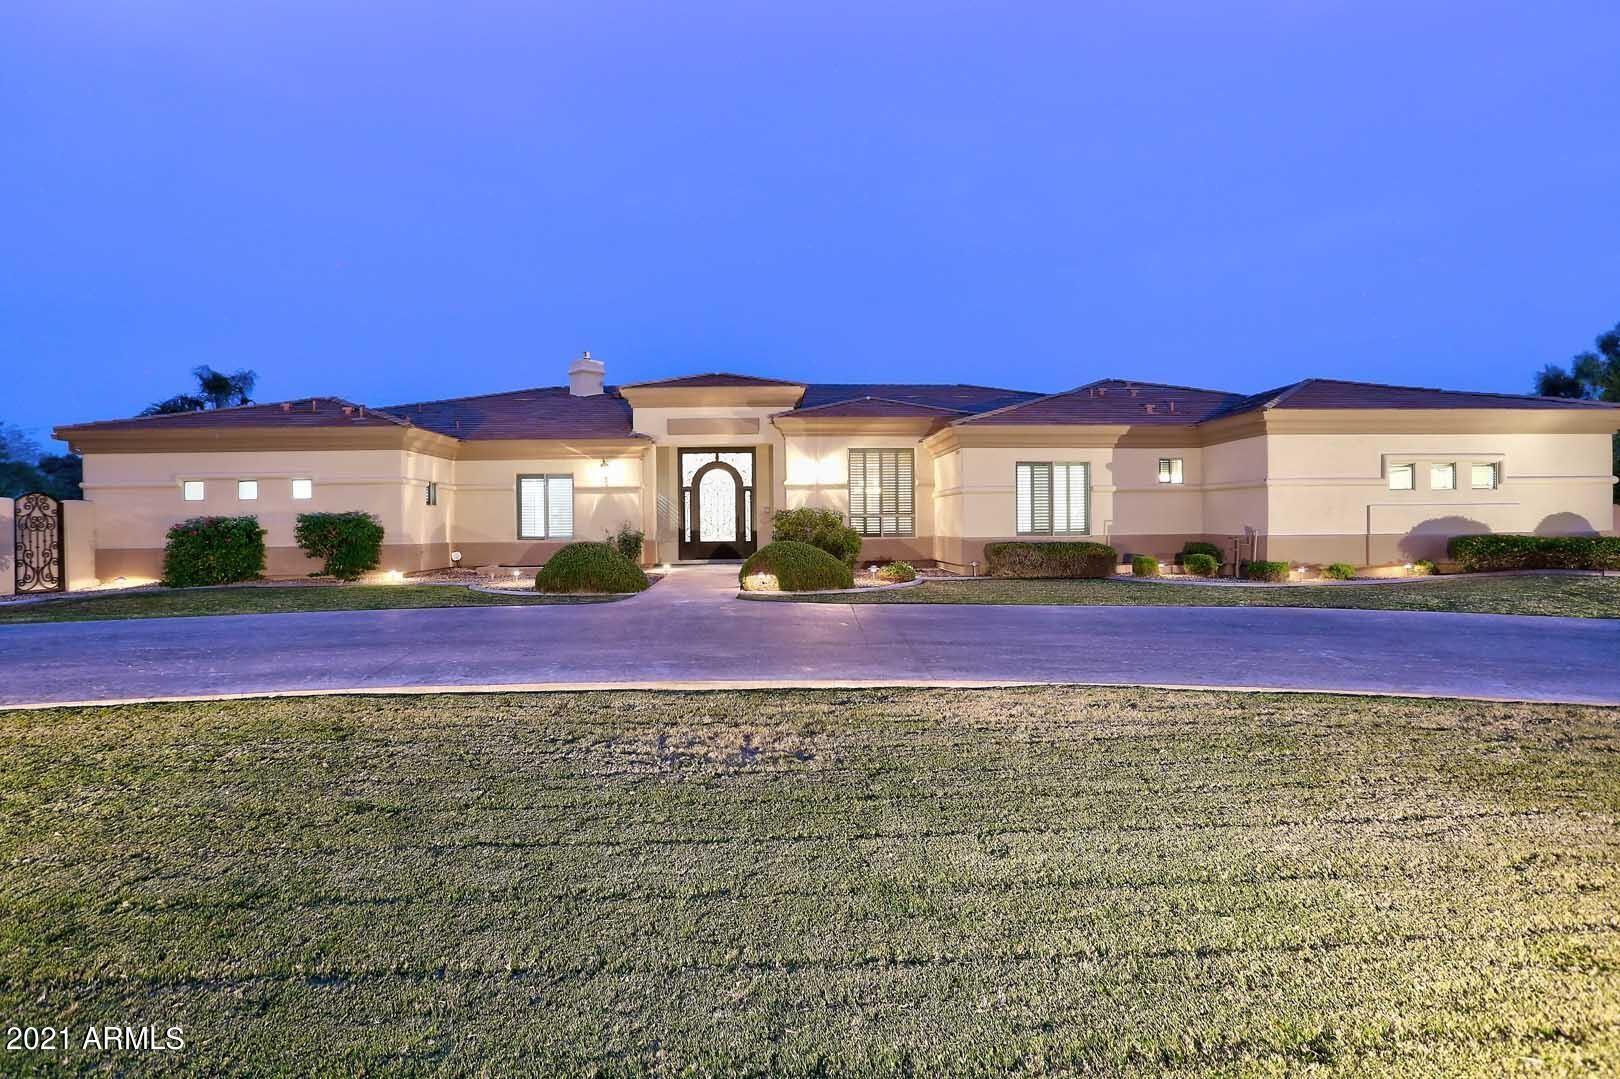 12775 N 71ST Avenue, Peoria, AZ 85381 - MLS#: 6252307